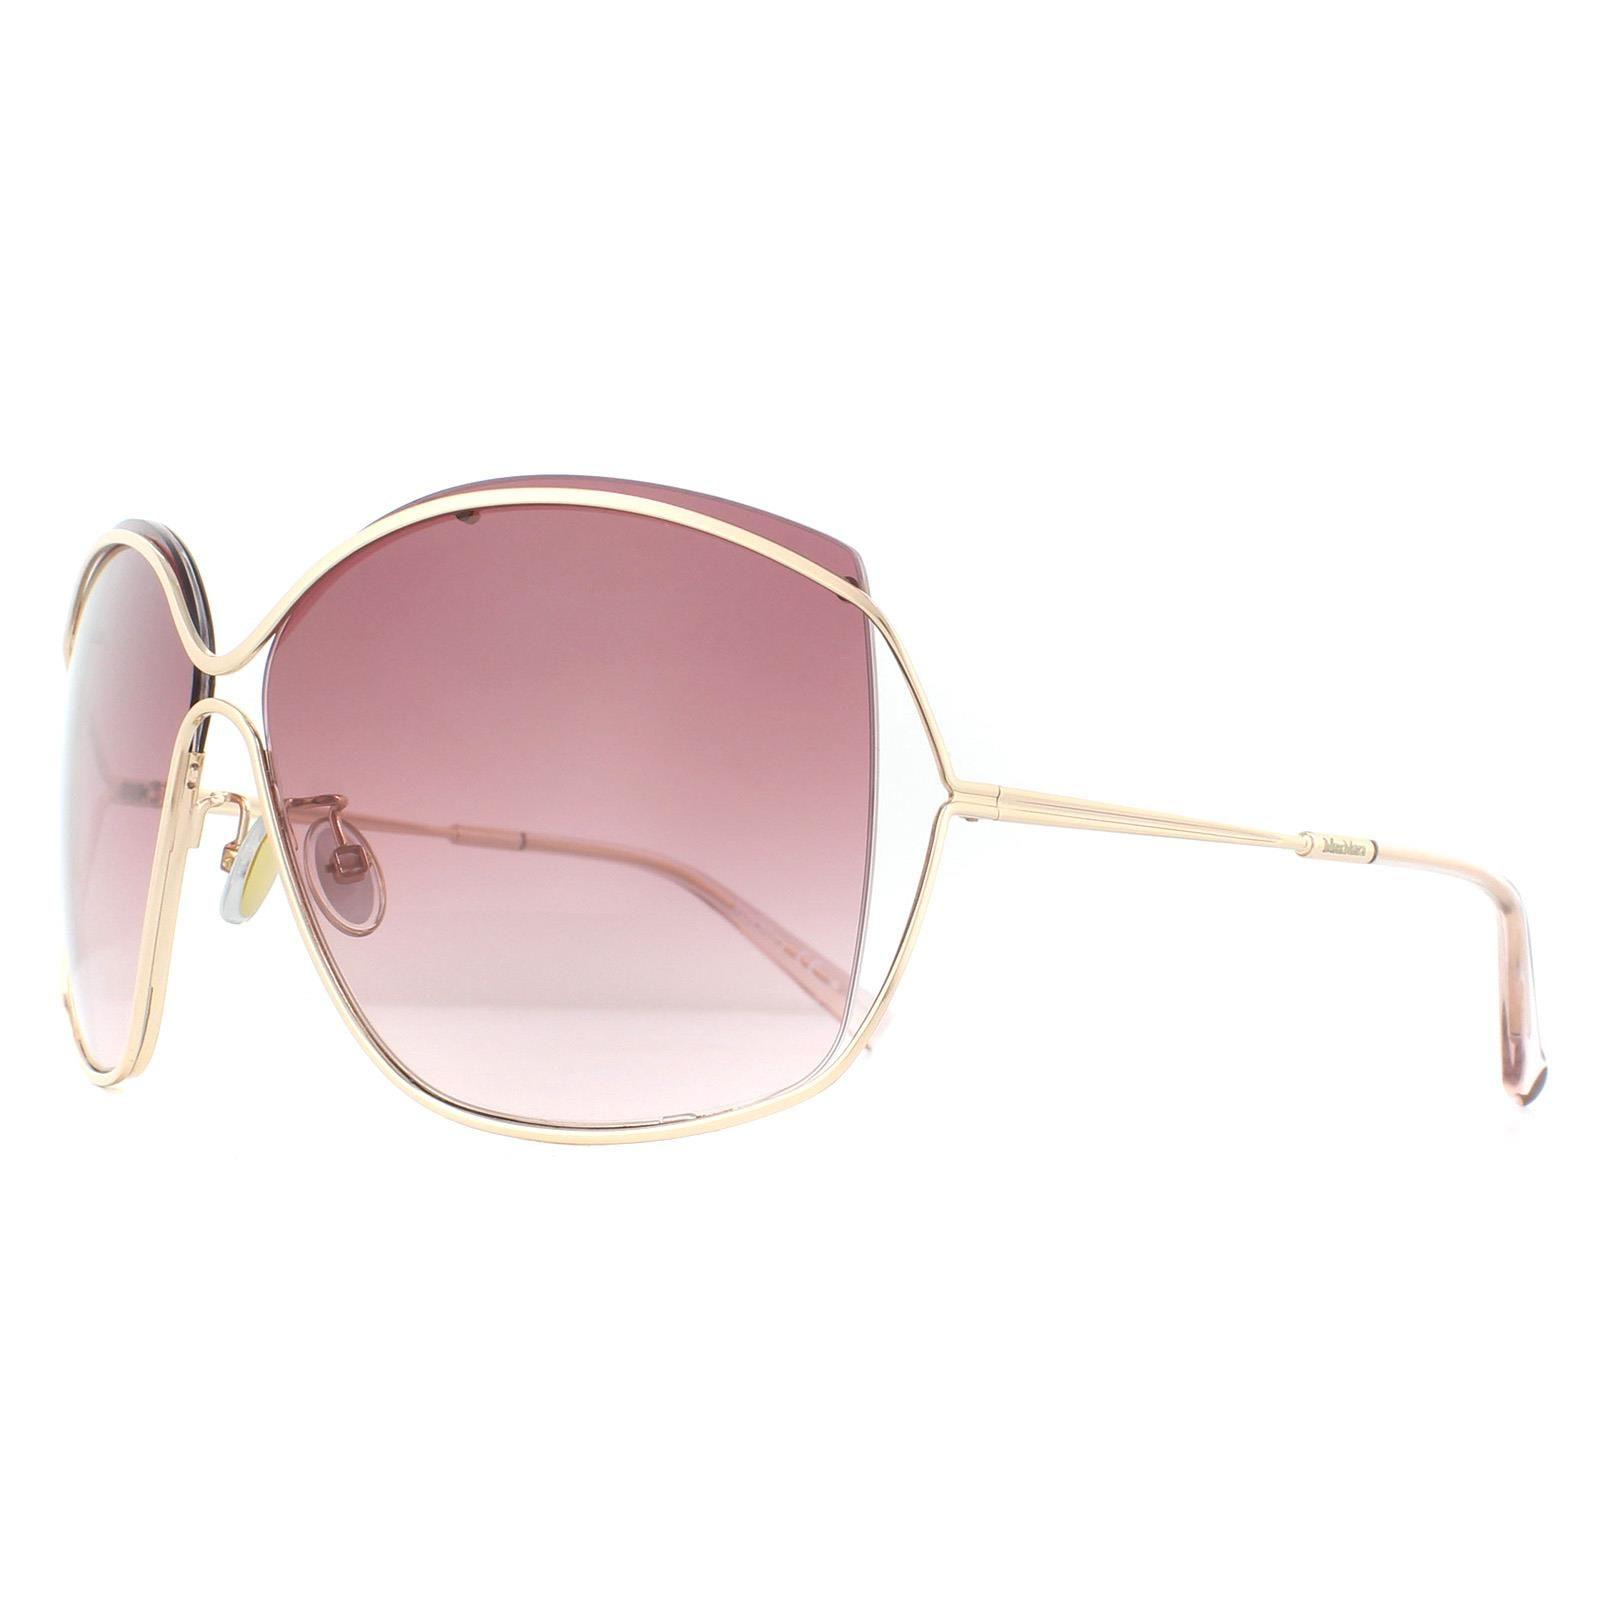 Max Mara Sunglasses Line DDB 3X Gold Copper Pink Gradient